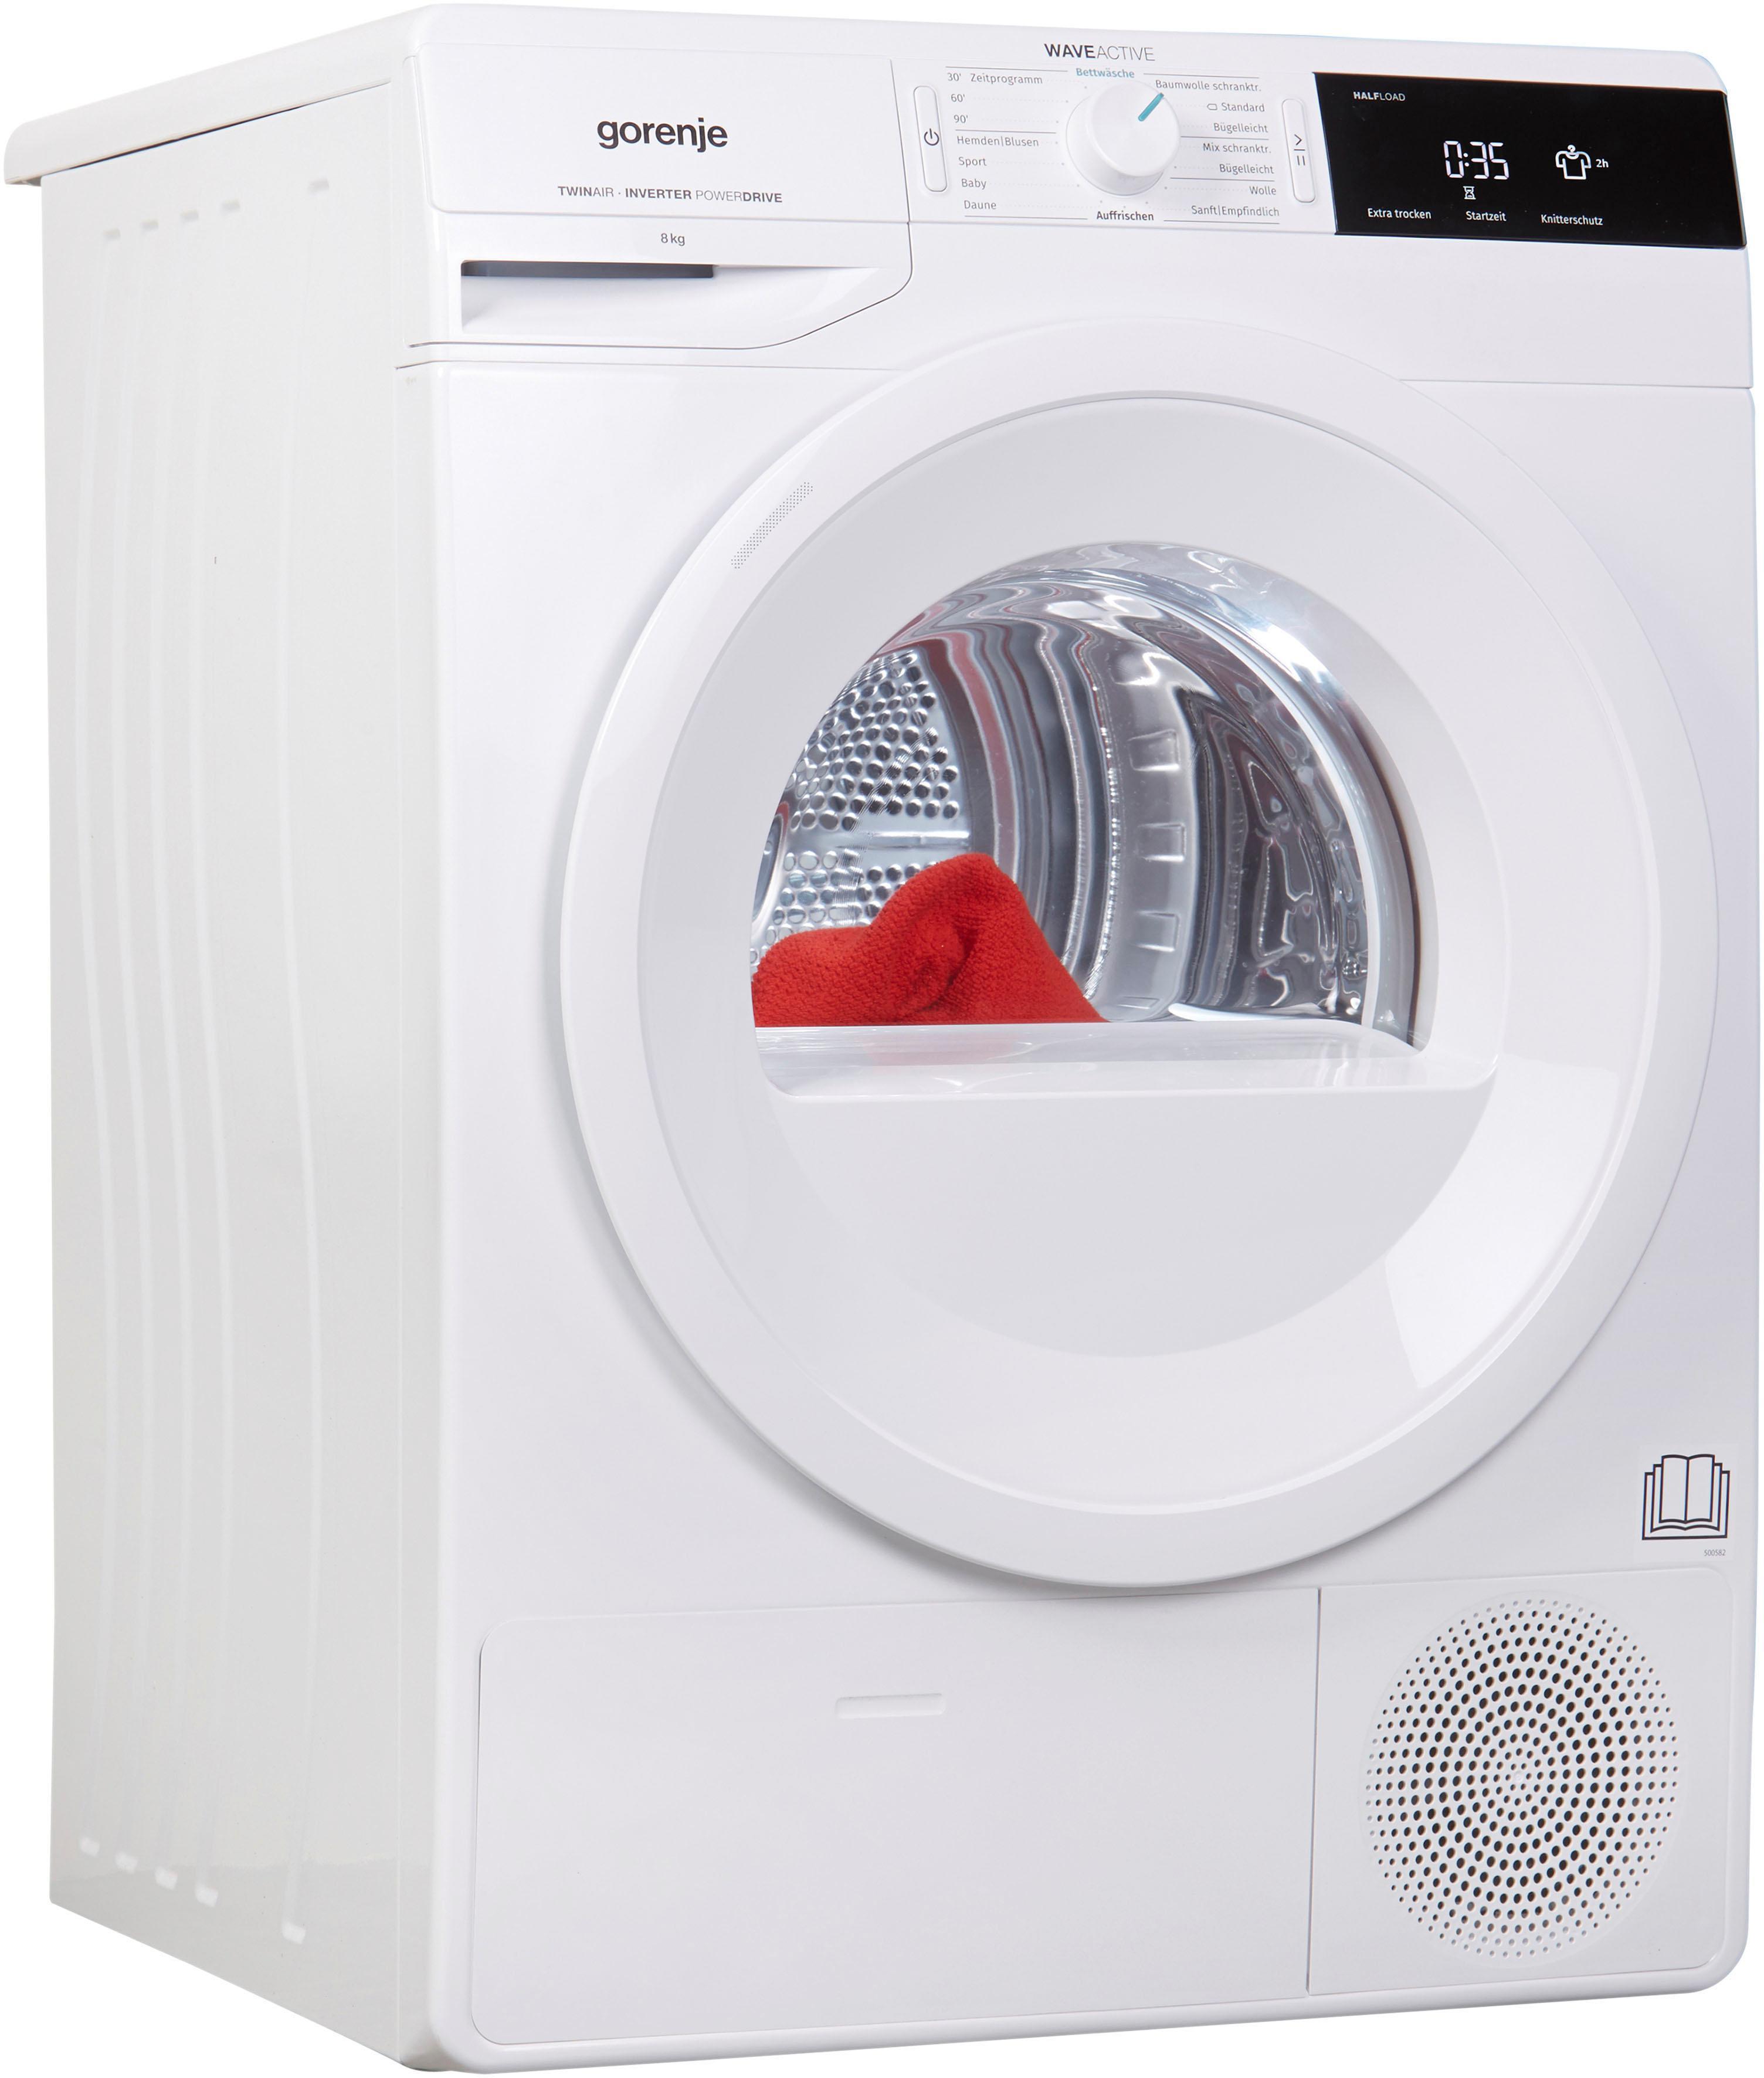 GORENJE Wärmepumpentrockner DE83, 8 kg | Bad > Waschmaschinen und Trockner > Wärmepumpentrockner | Gorenje